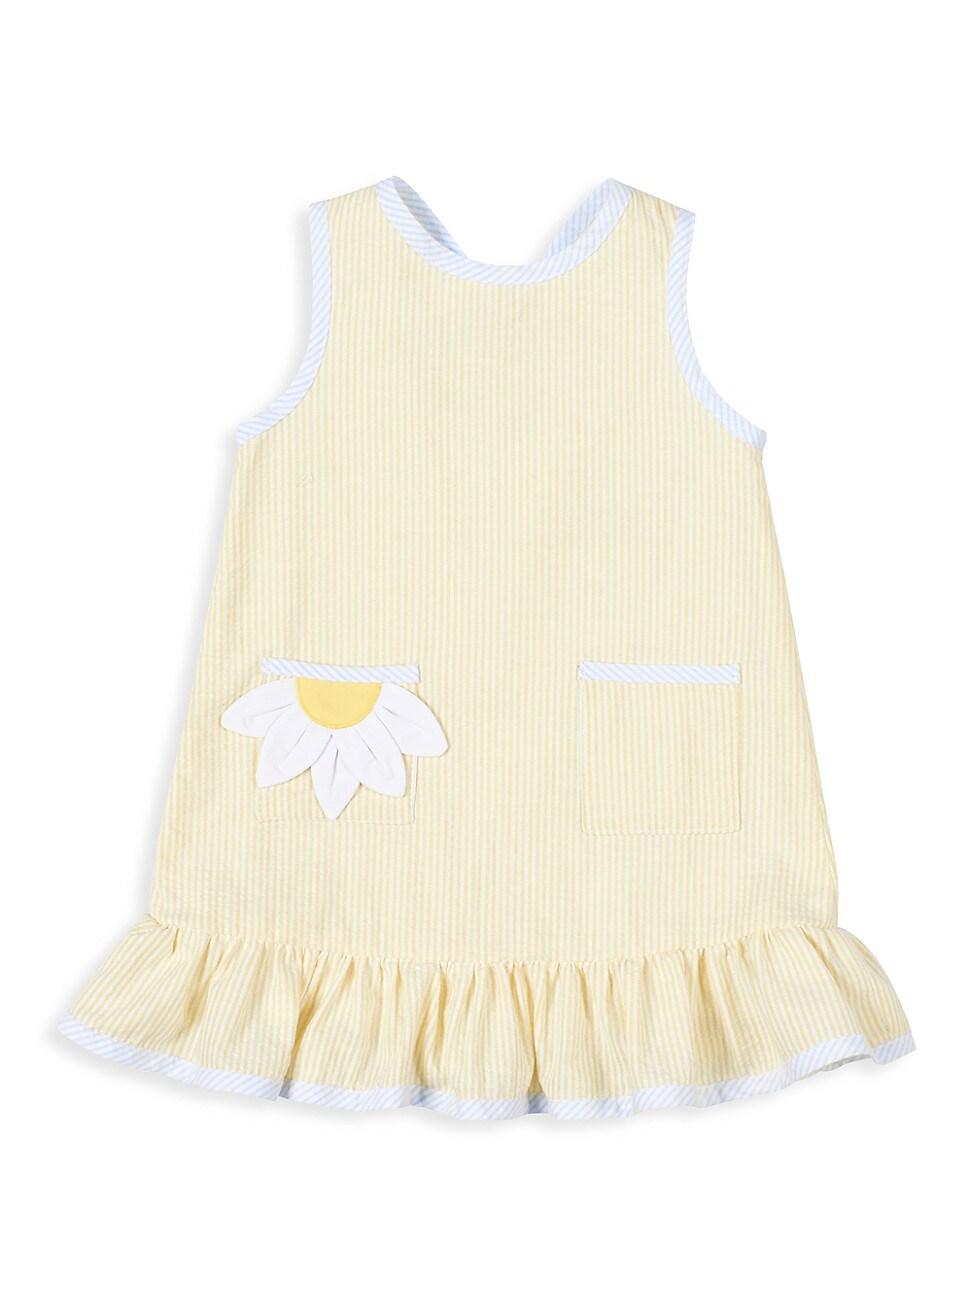 Florence Eiseman Dresses LITTLE GIRL'S DAISY FRESH SEERSUCKER DRESS